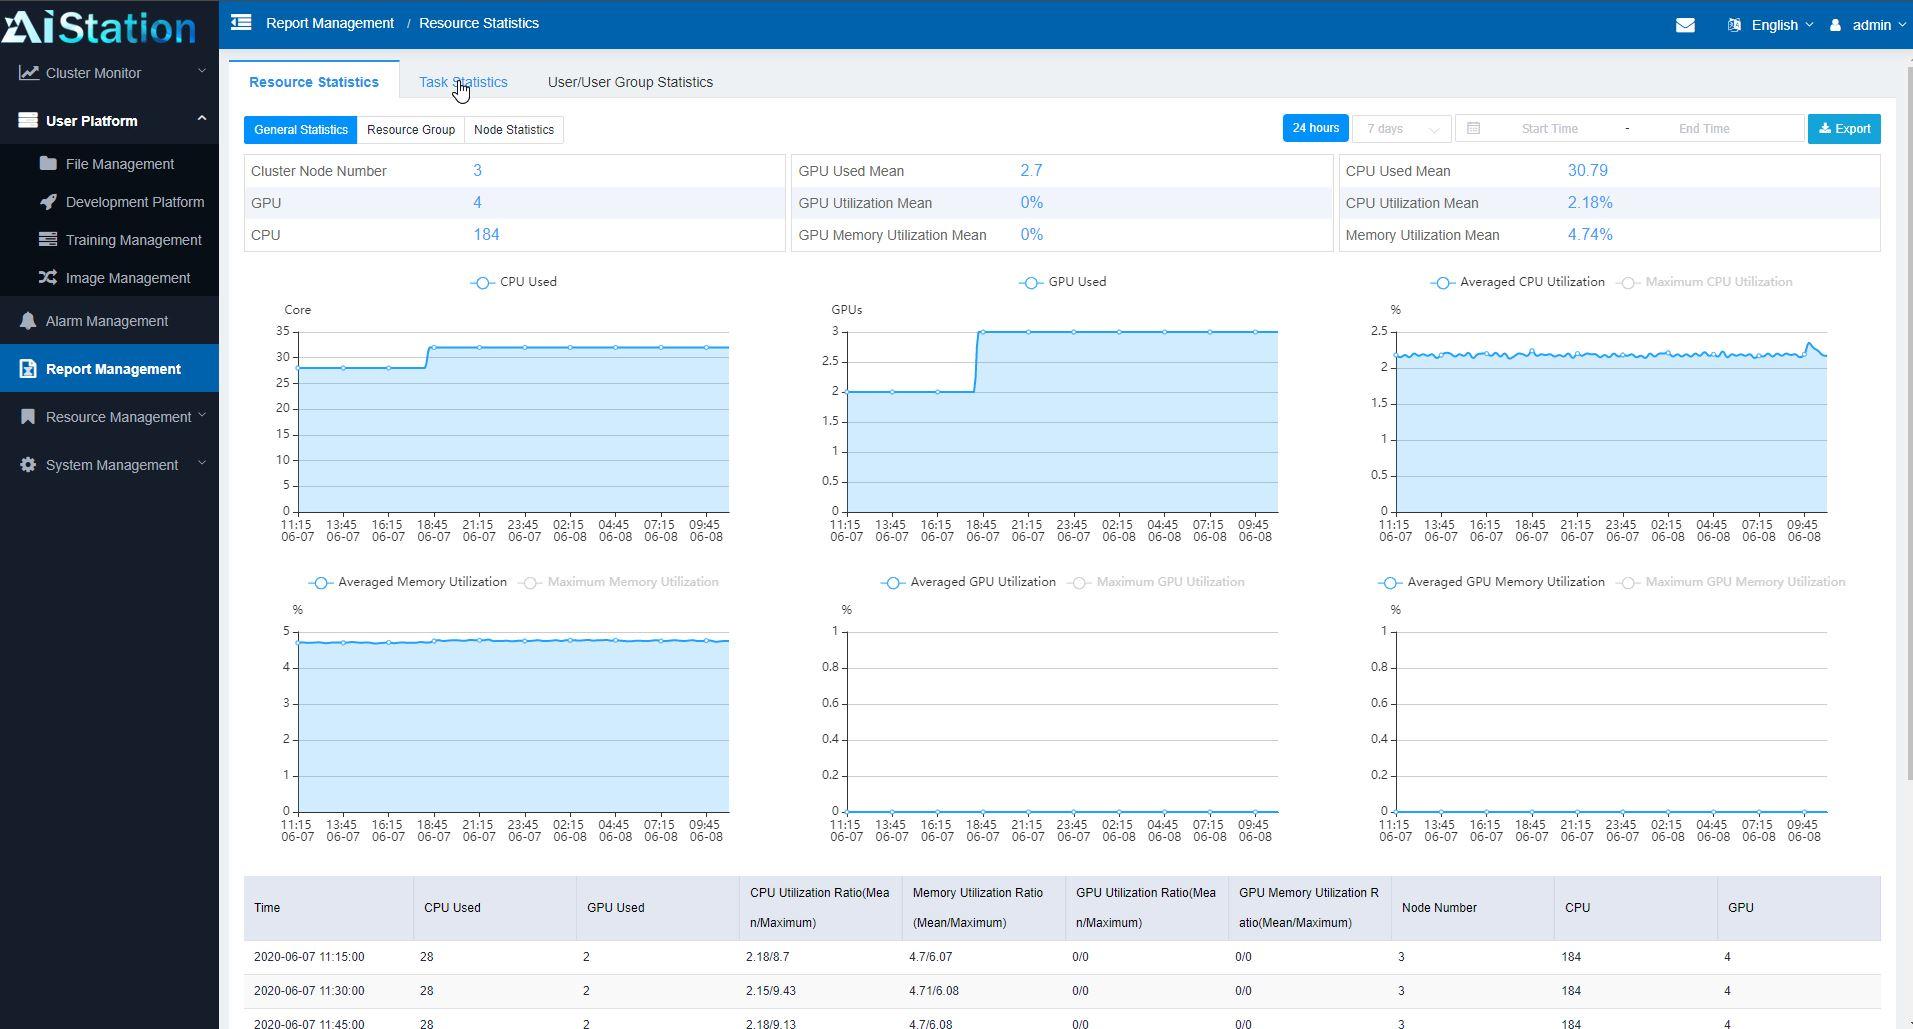 Inspur AIStation Admin Report Management Resource Statistics